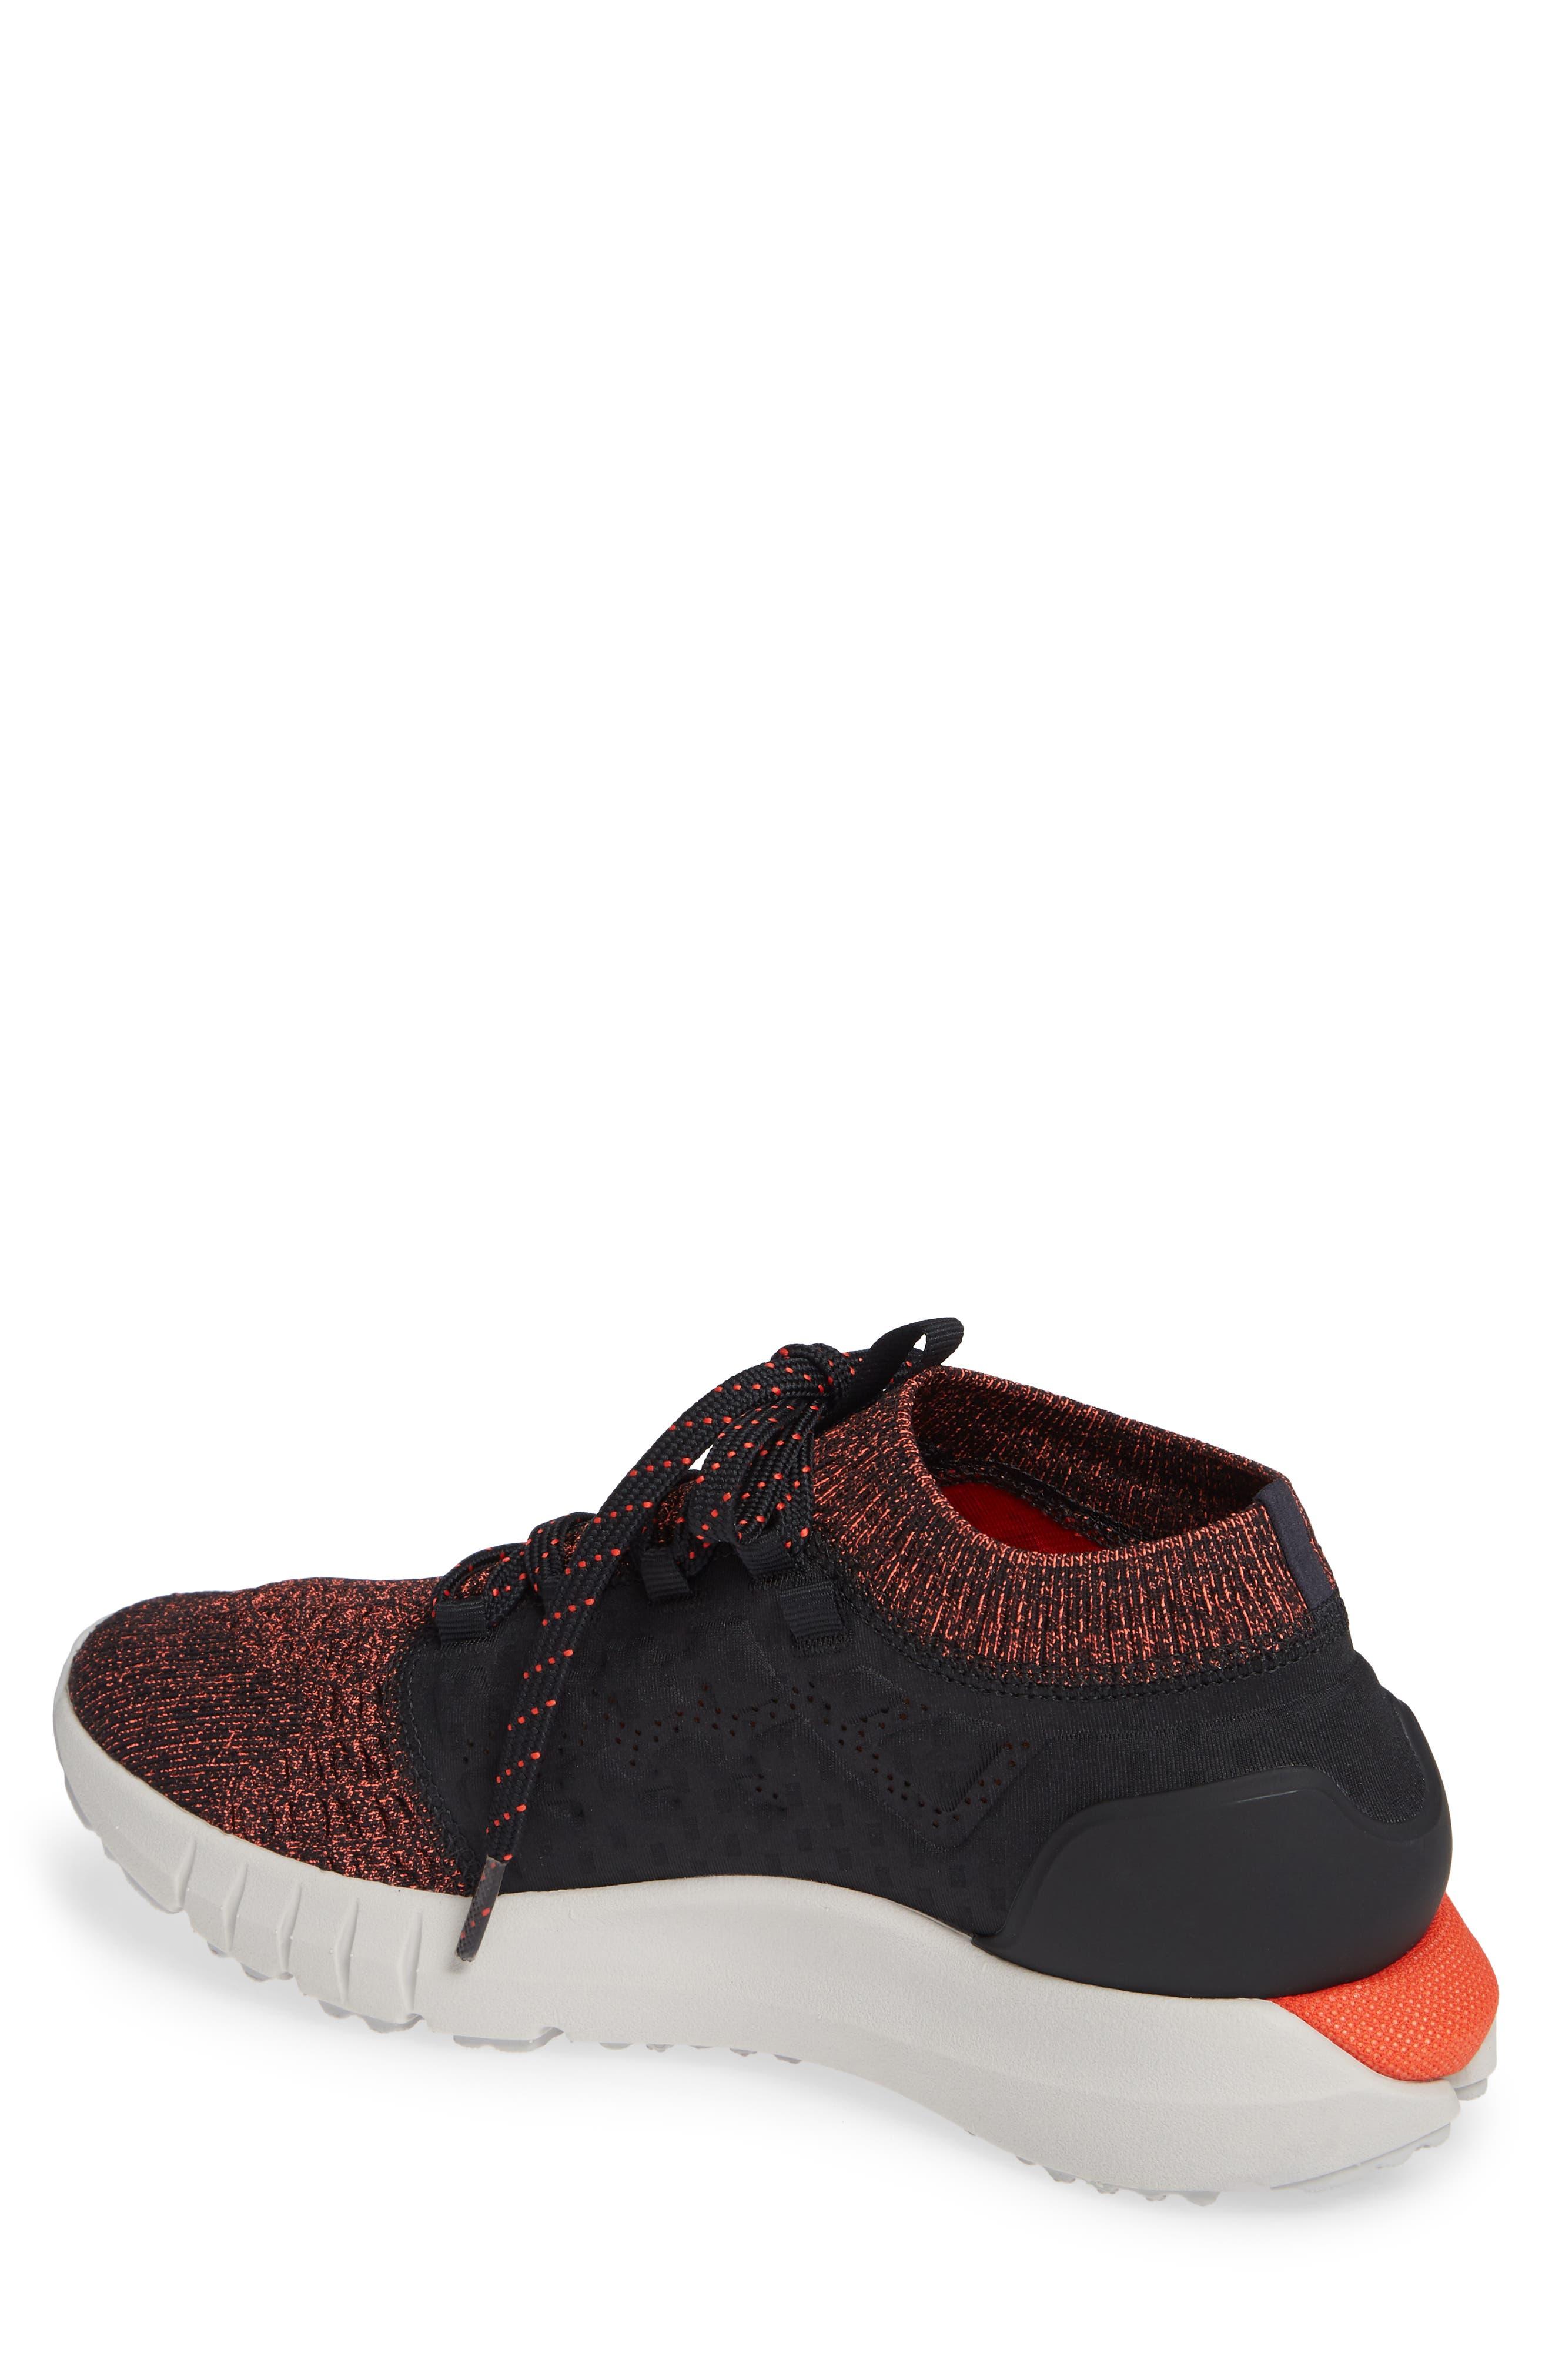 HOVR Phantom NC Sneaker,                             Alternate thumbnail 2, color,                             Black/ Ghost Grey/ Radio Red